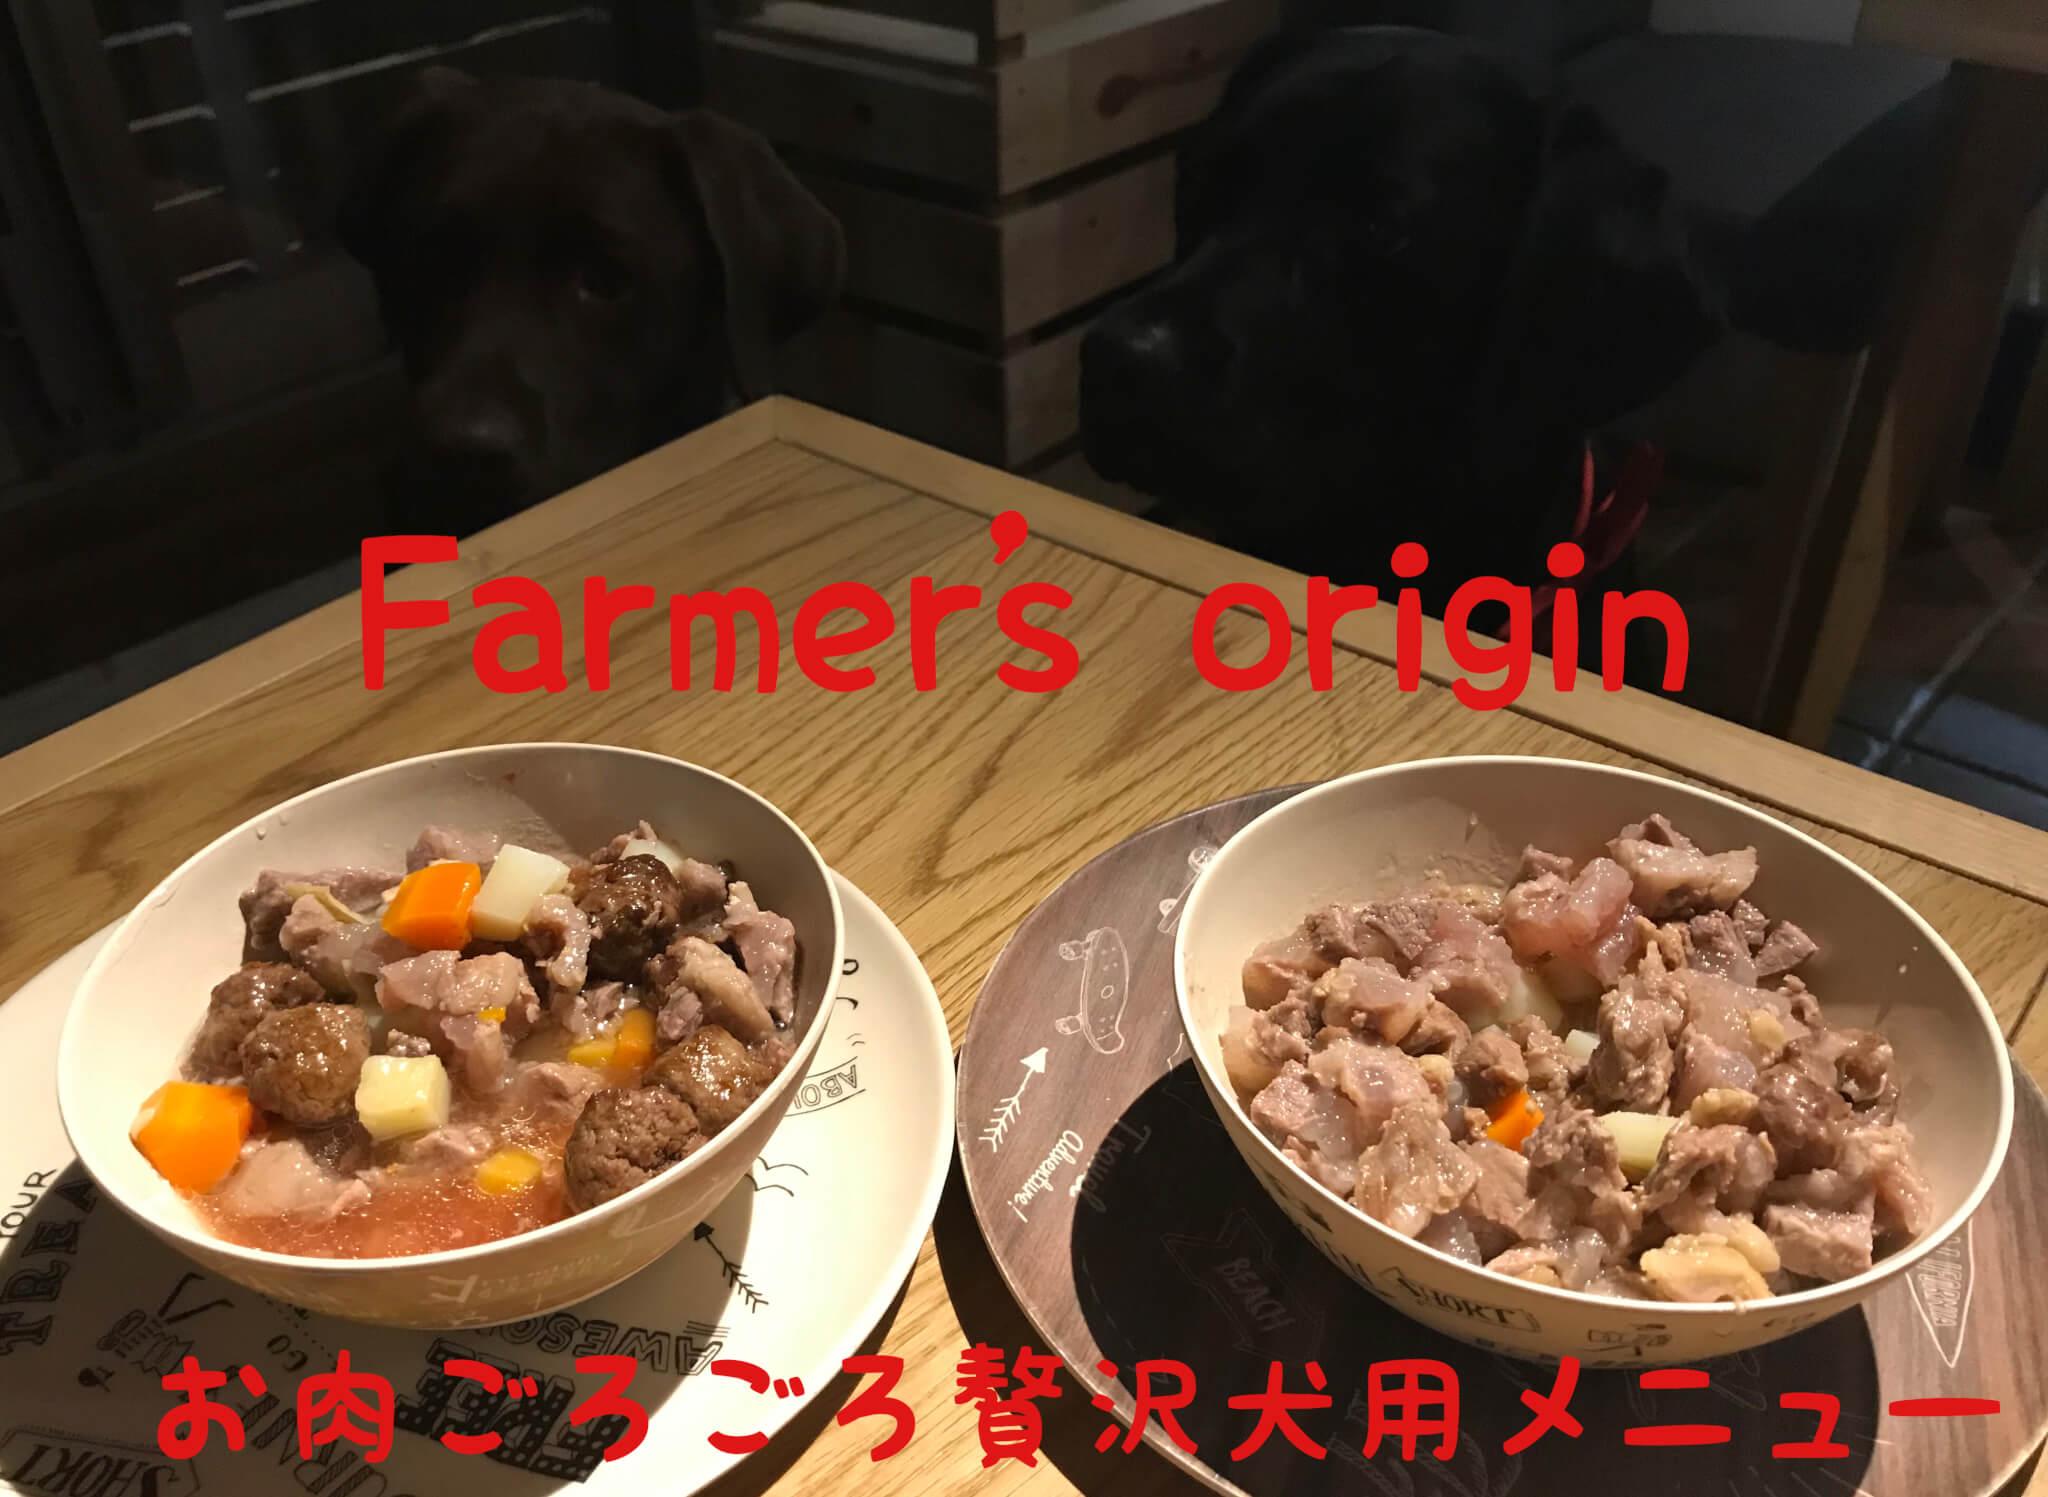 Farmer's origin お肉ゴロゴロ贅沢犬用メニュー